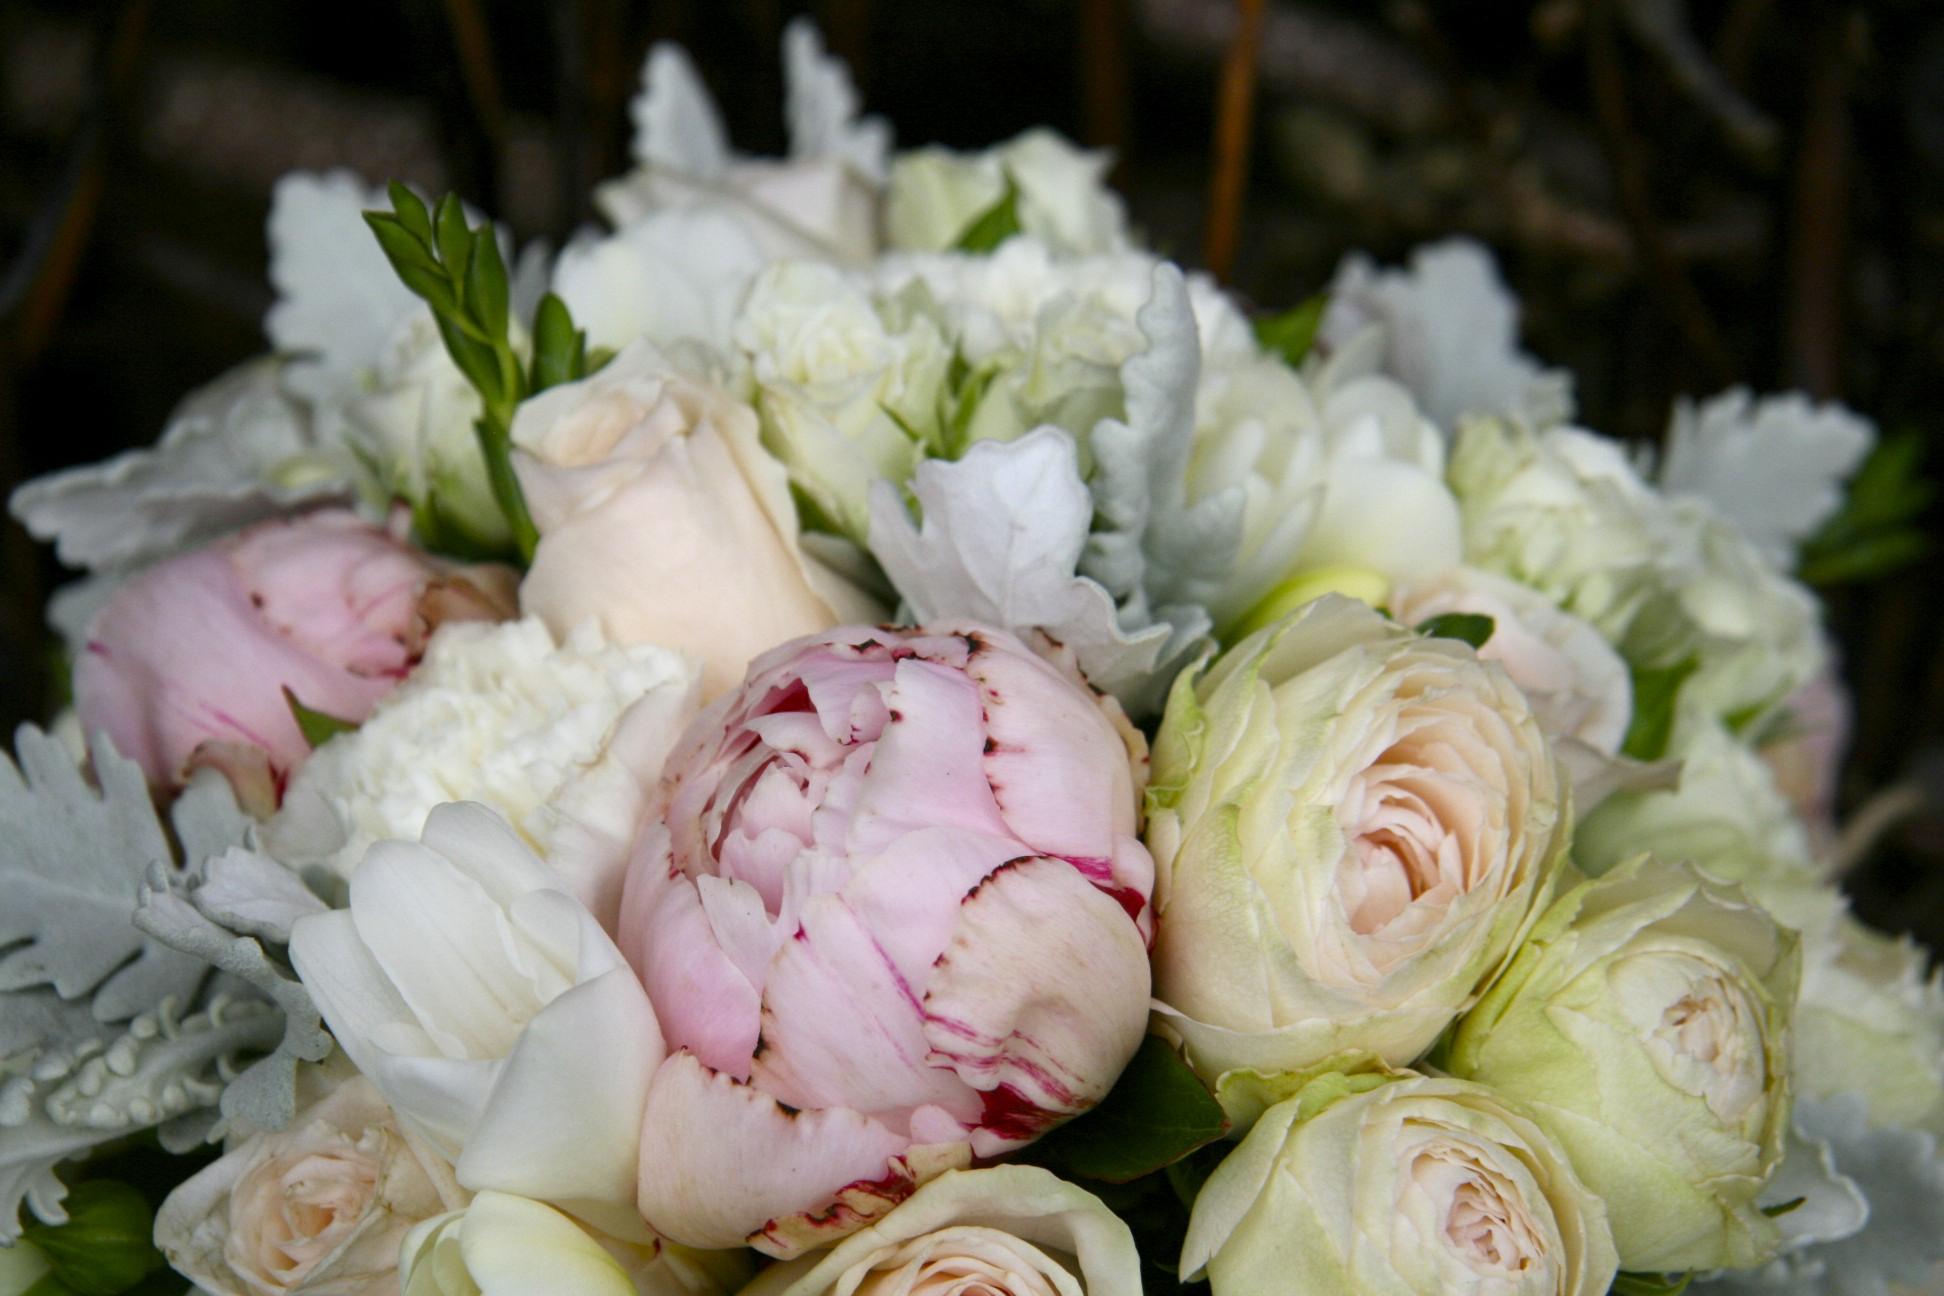 peonies wedding bouquet photo - 1